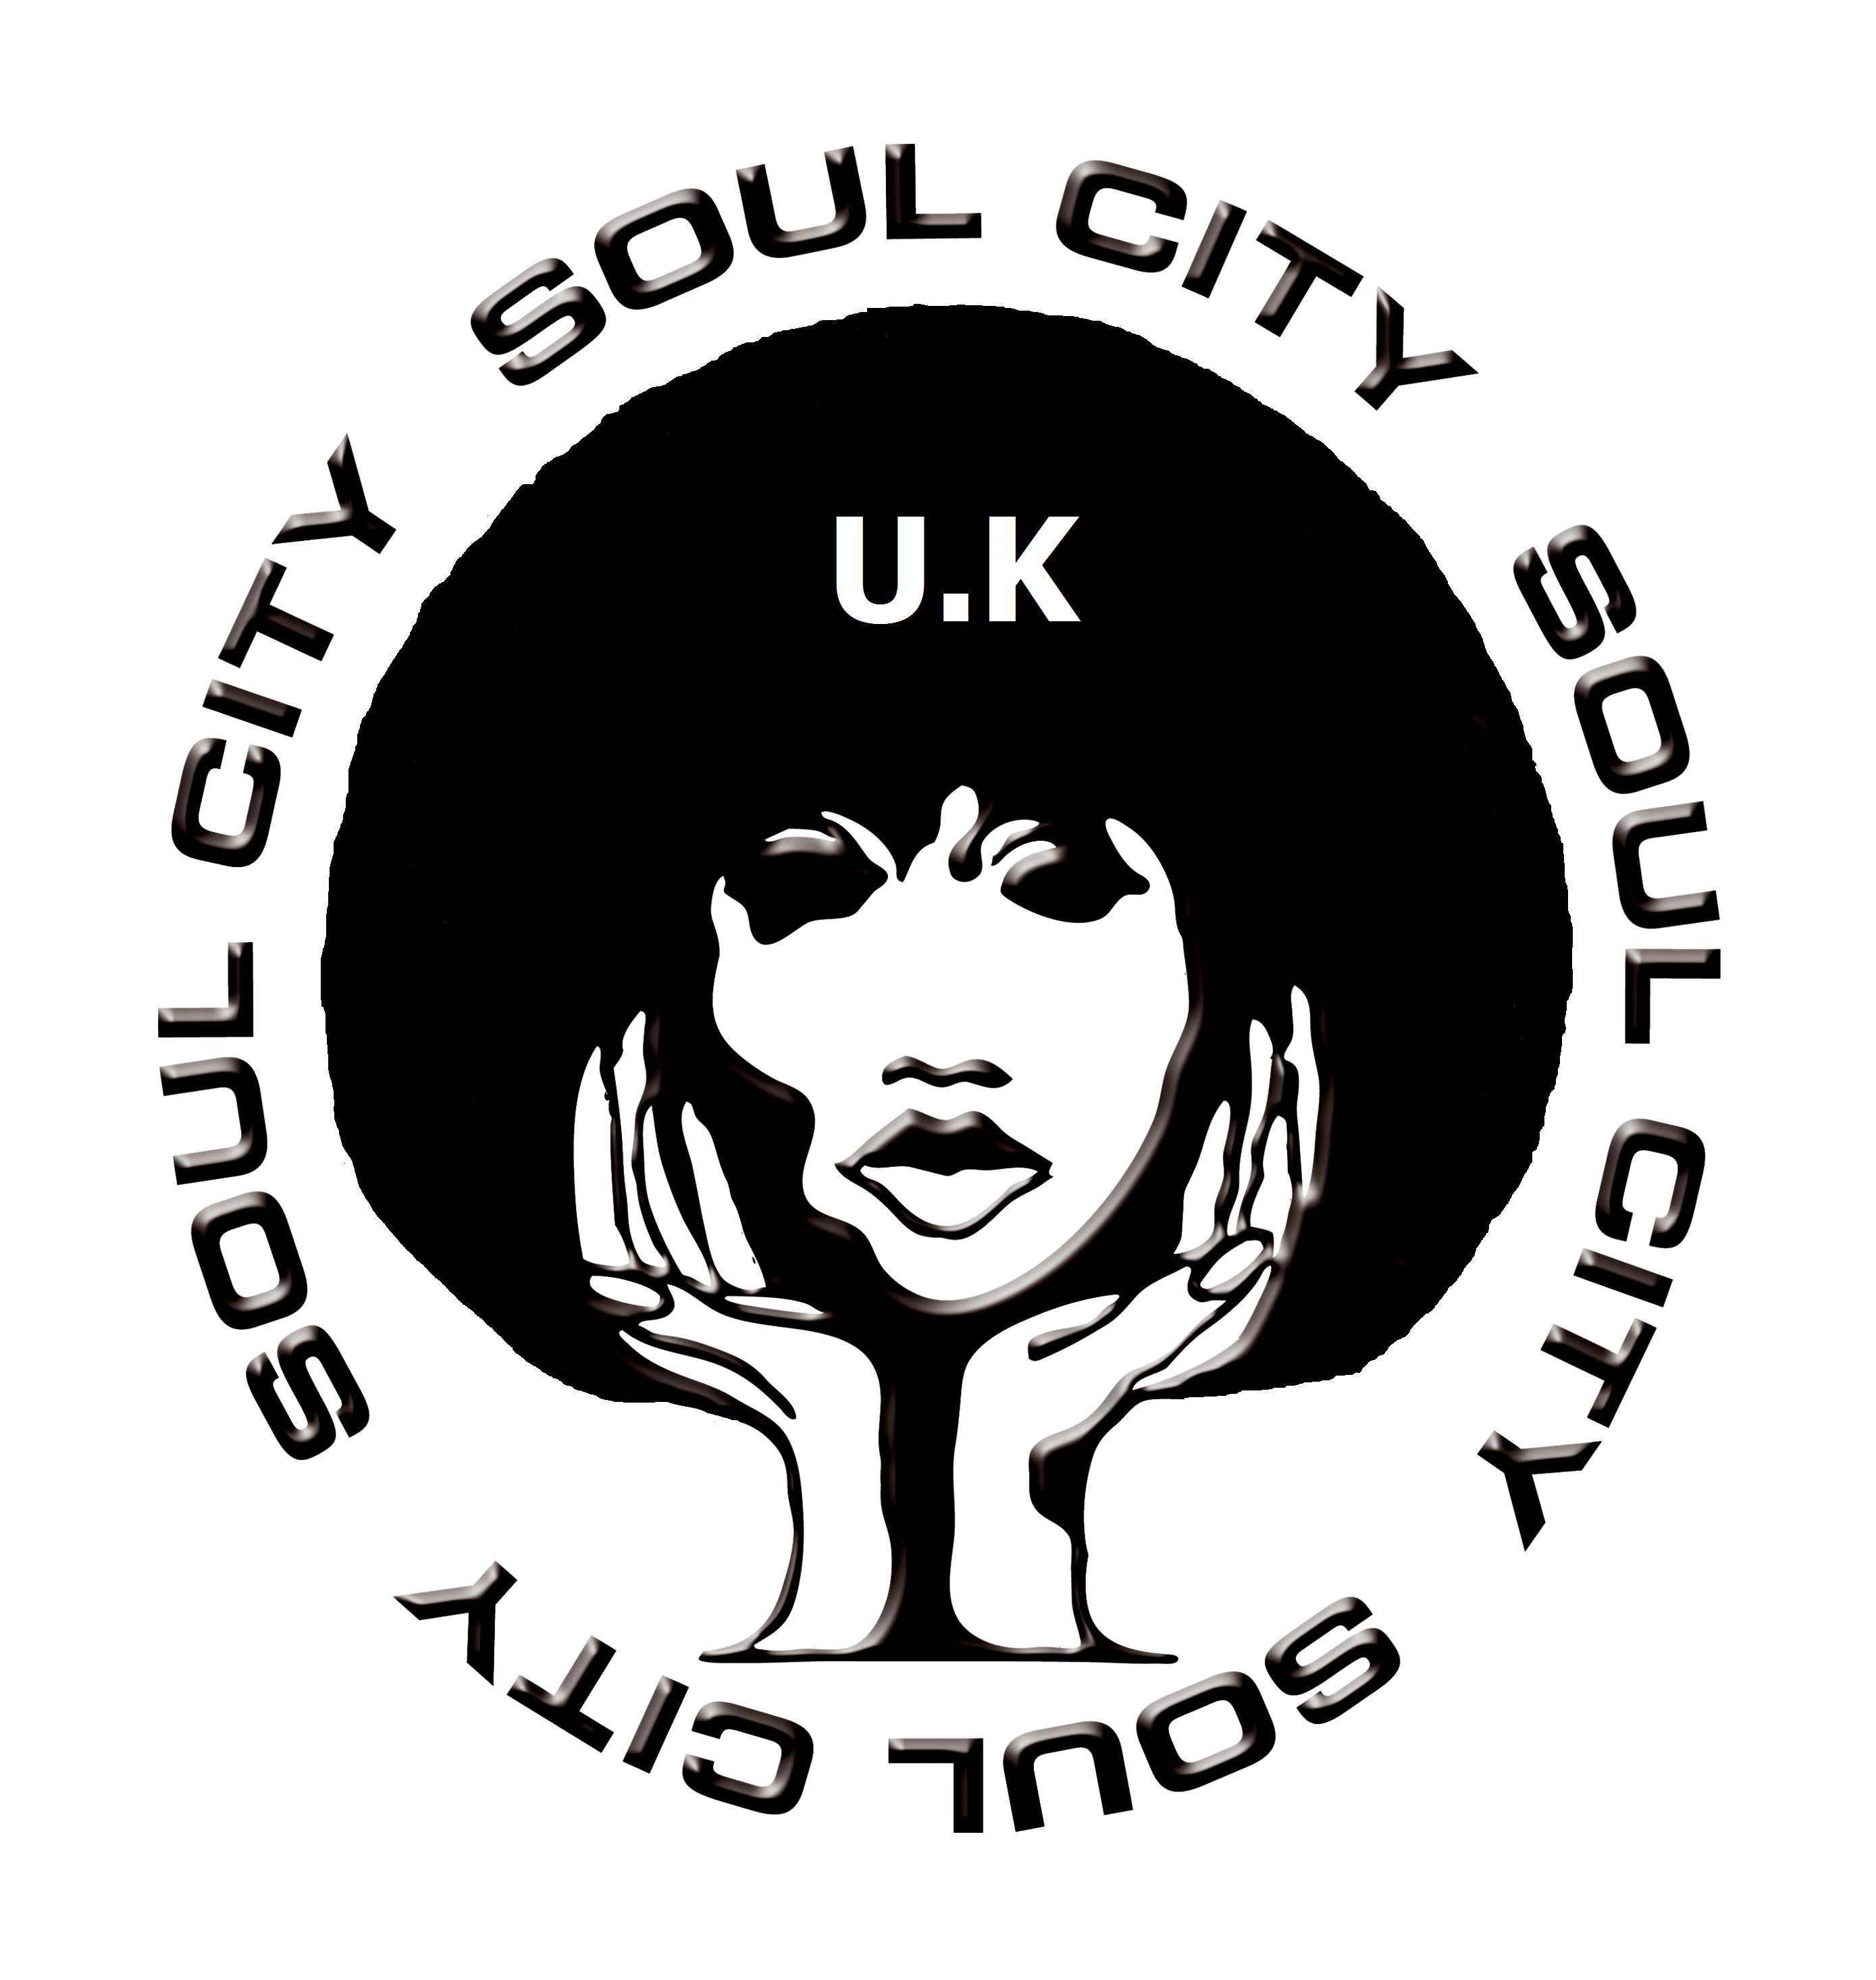 Soul City U.K